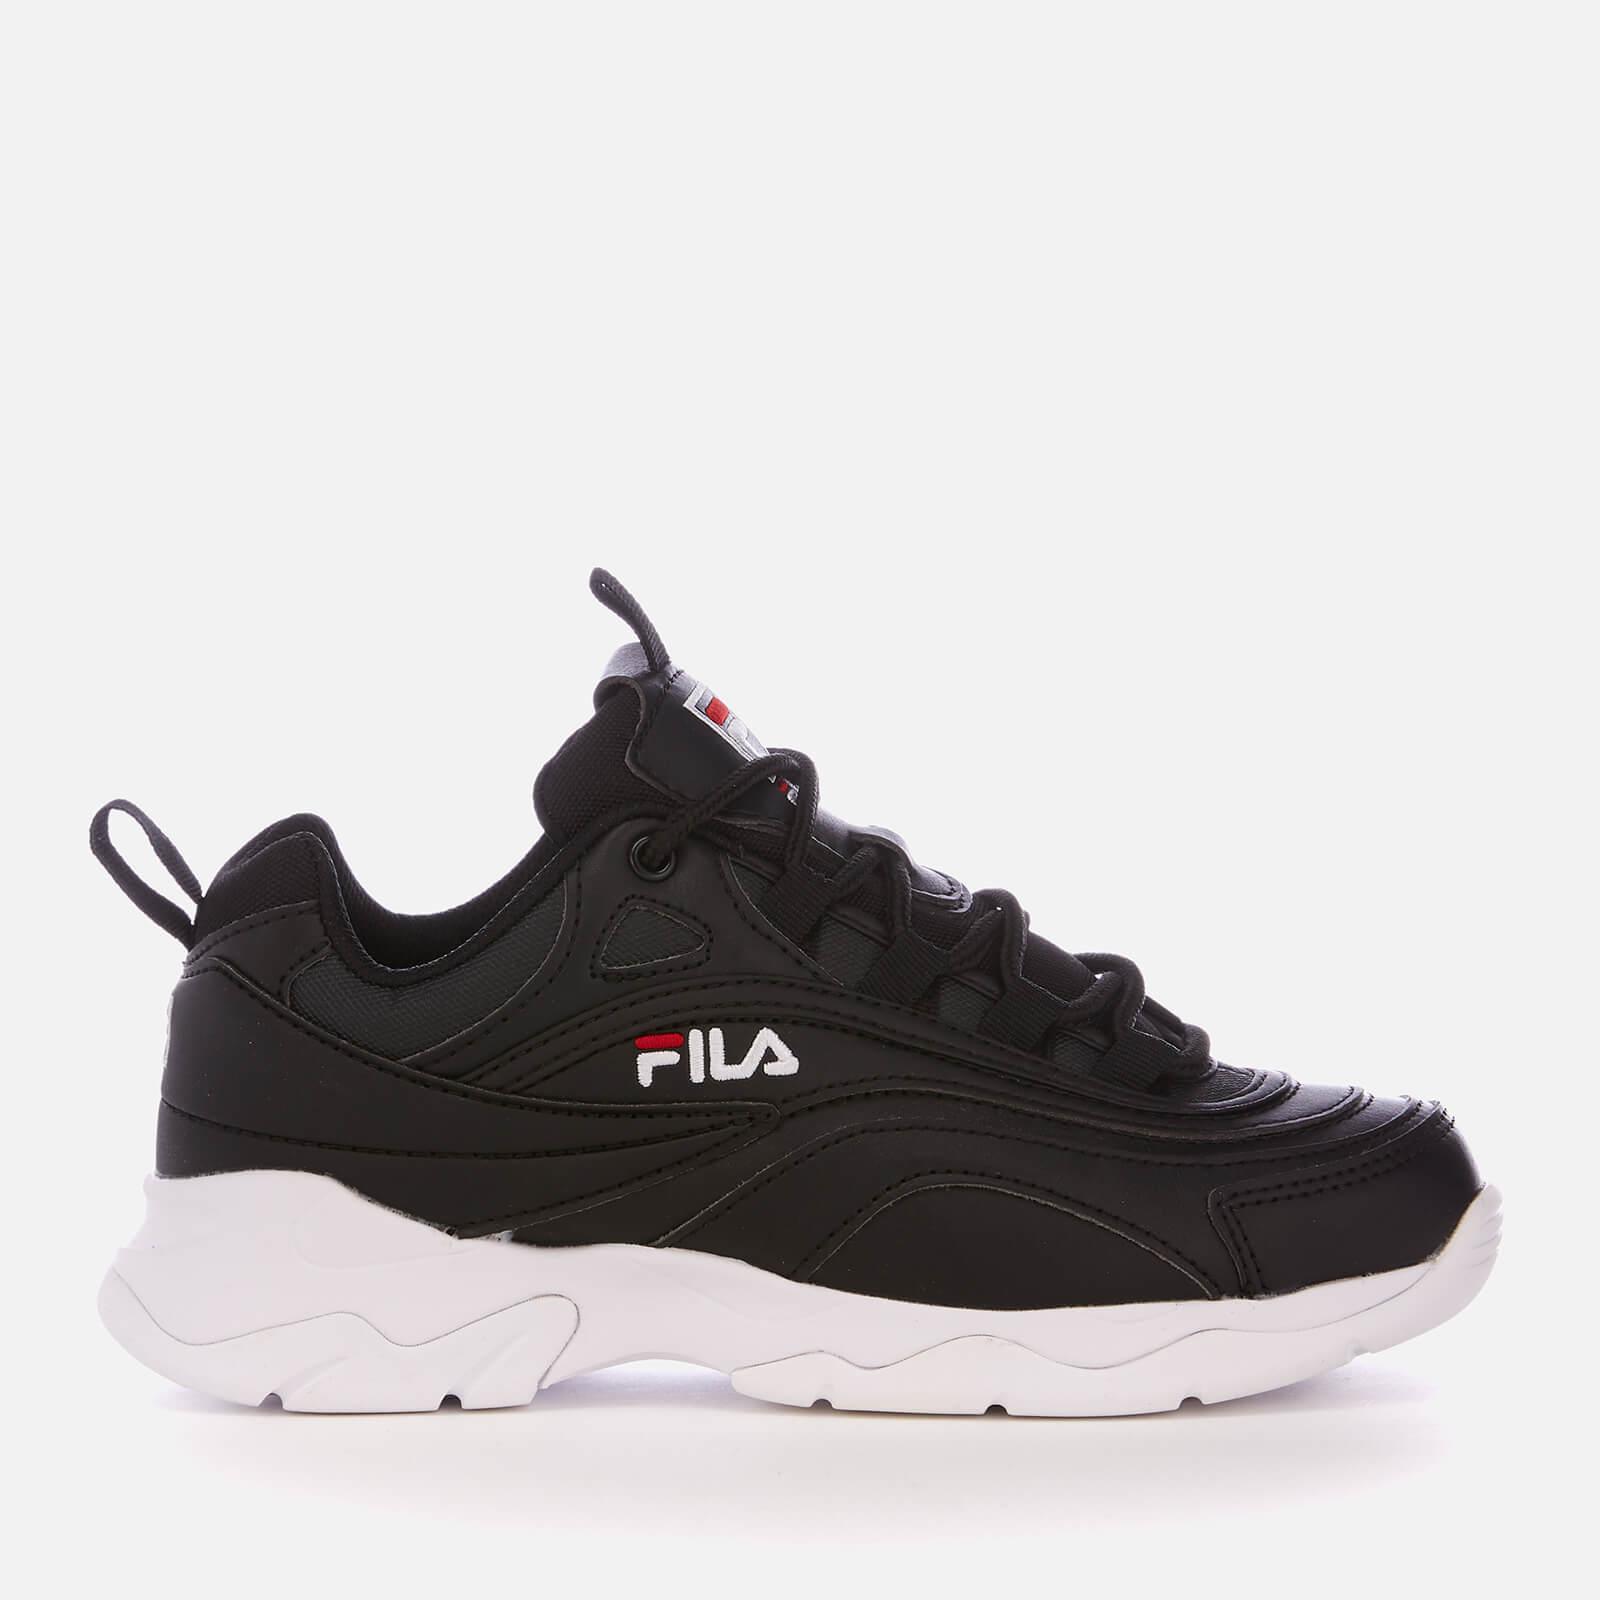 FILA Ray Trainers - Black/FILA Red